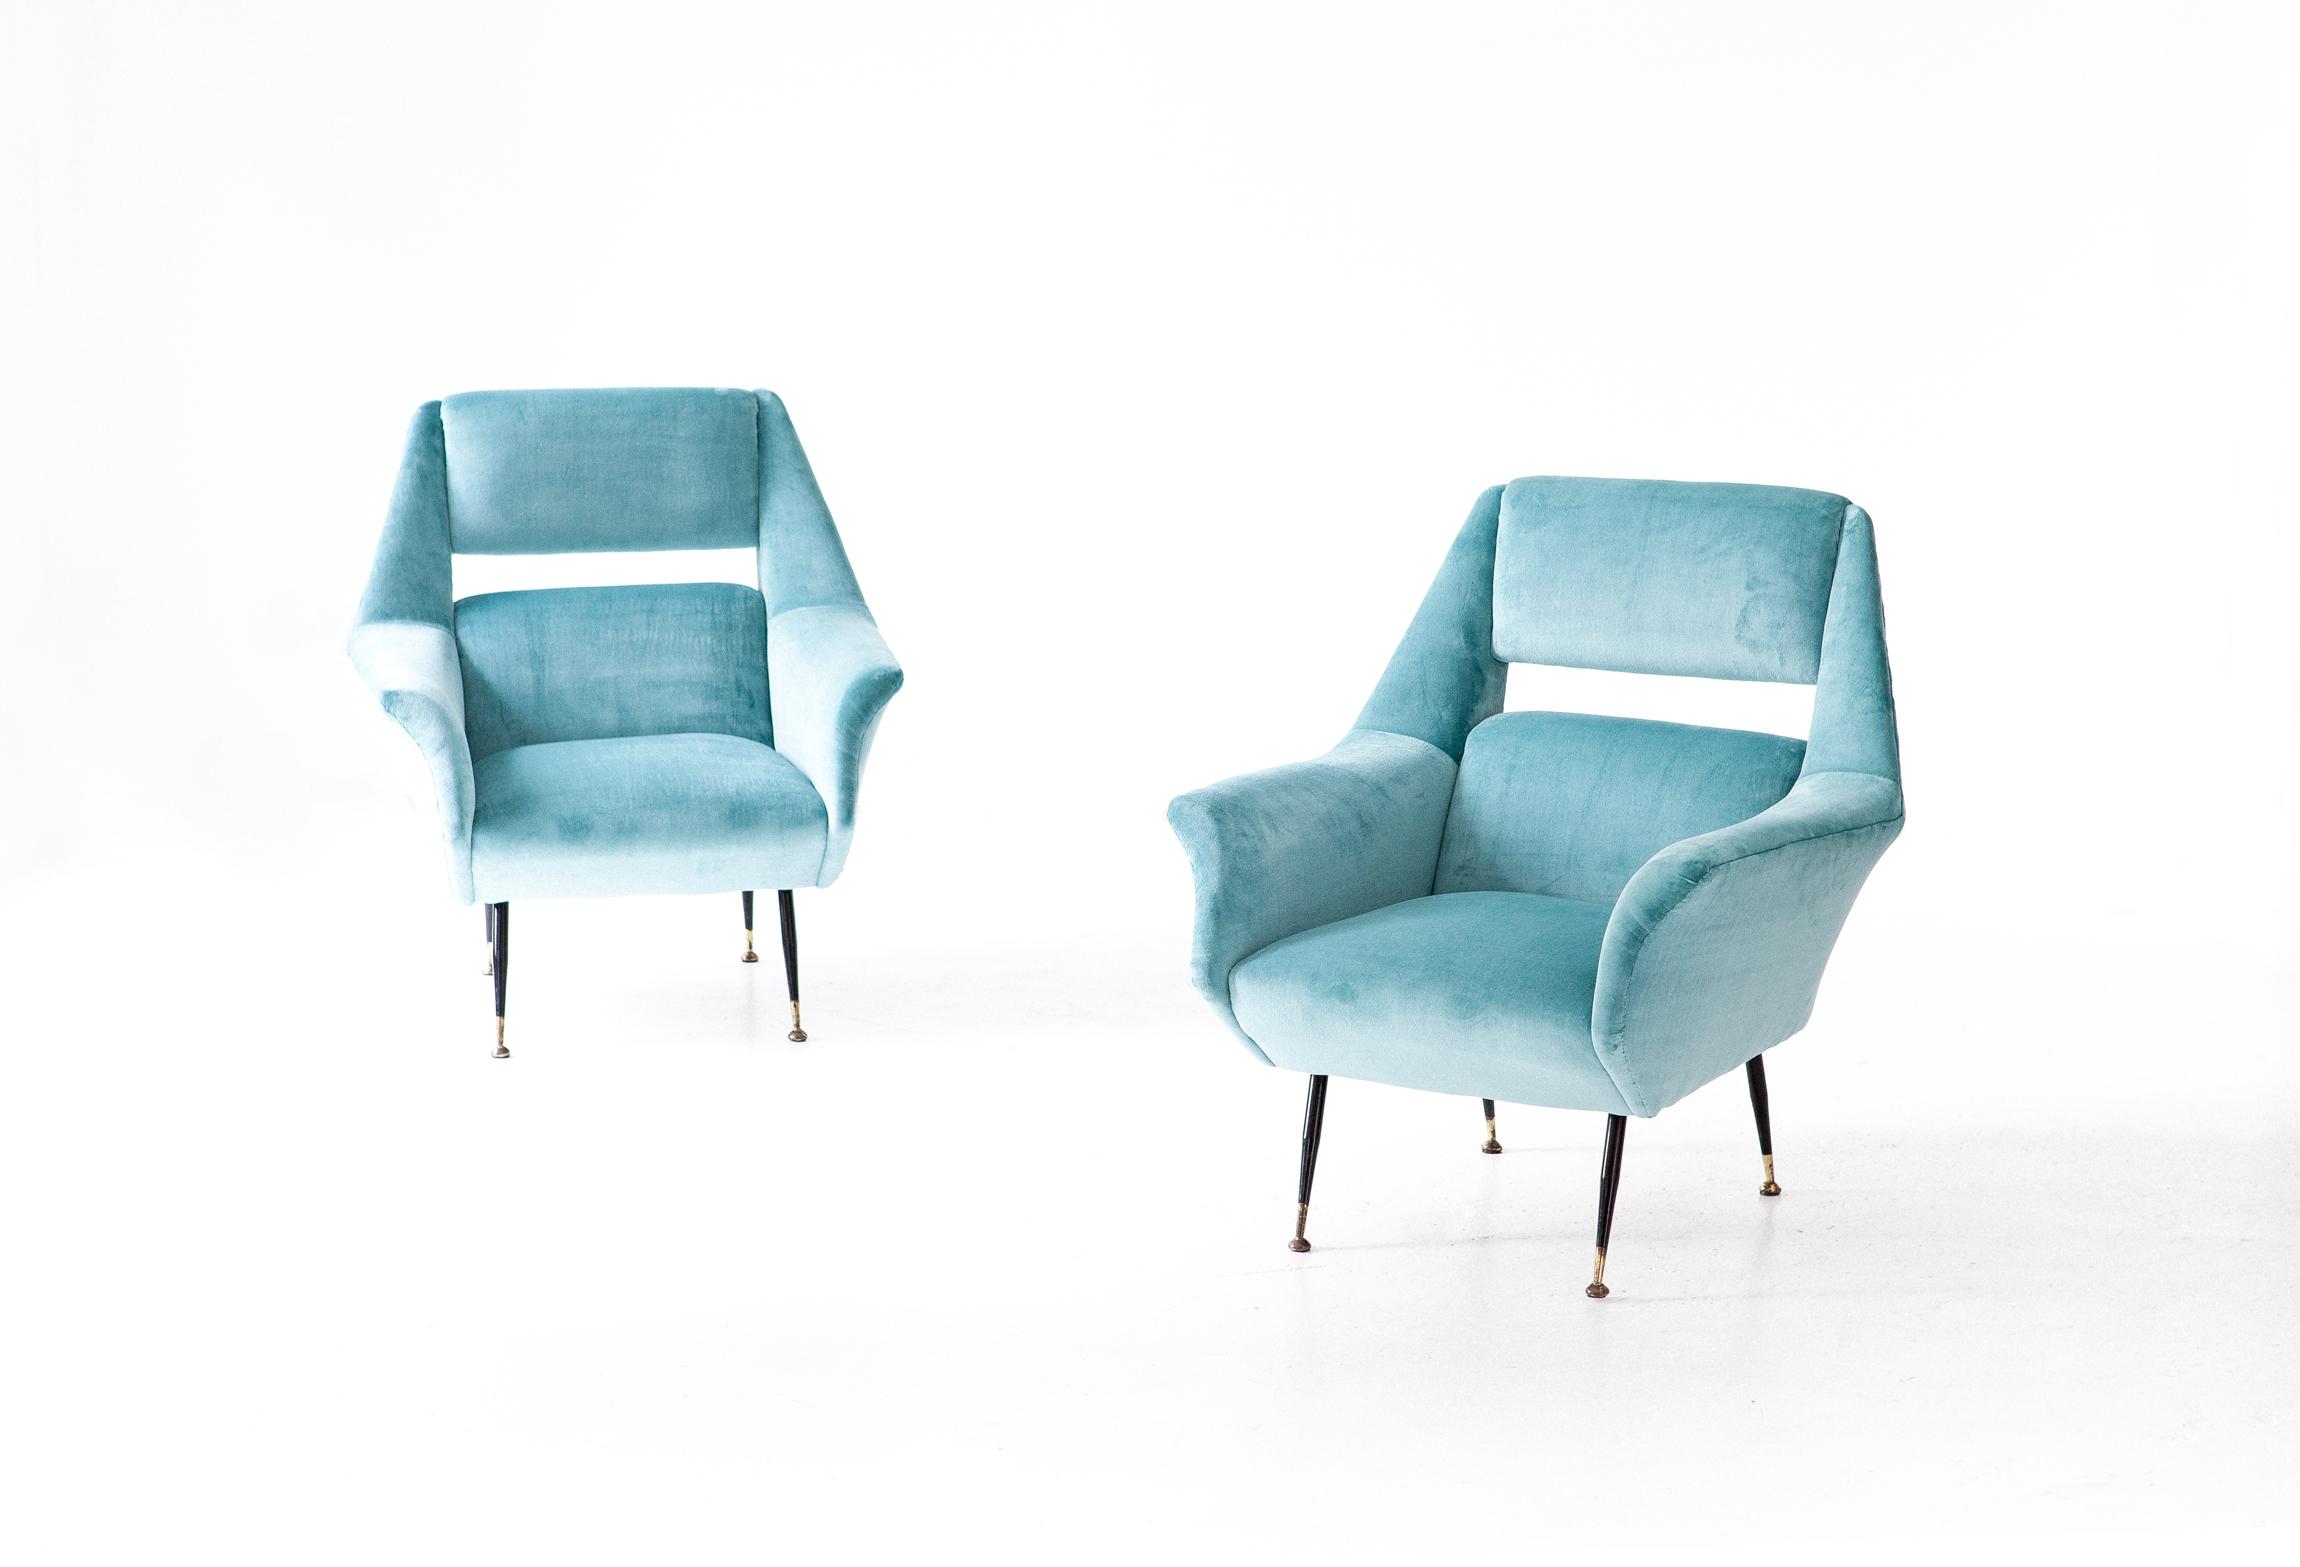 lounge-torquise-armchairs-by-gigi-radice-for-minotti-2